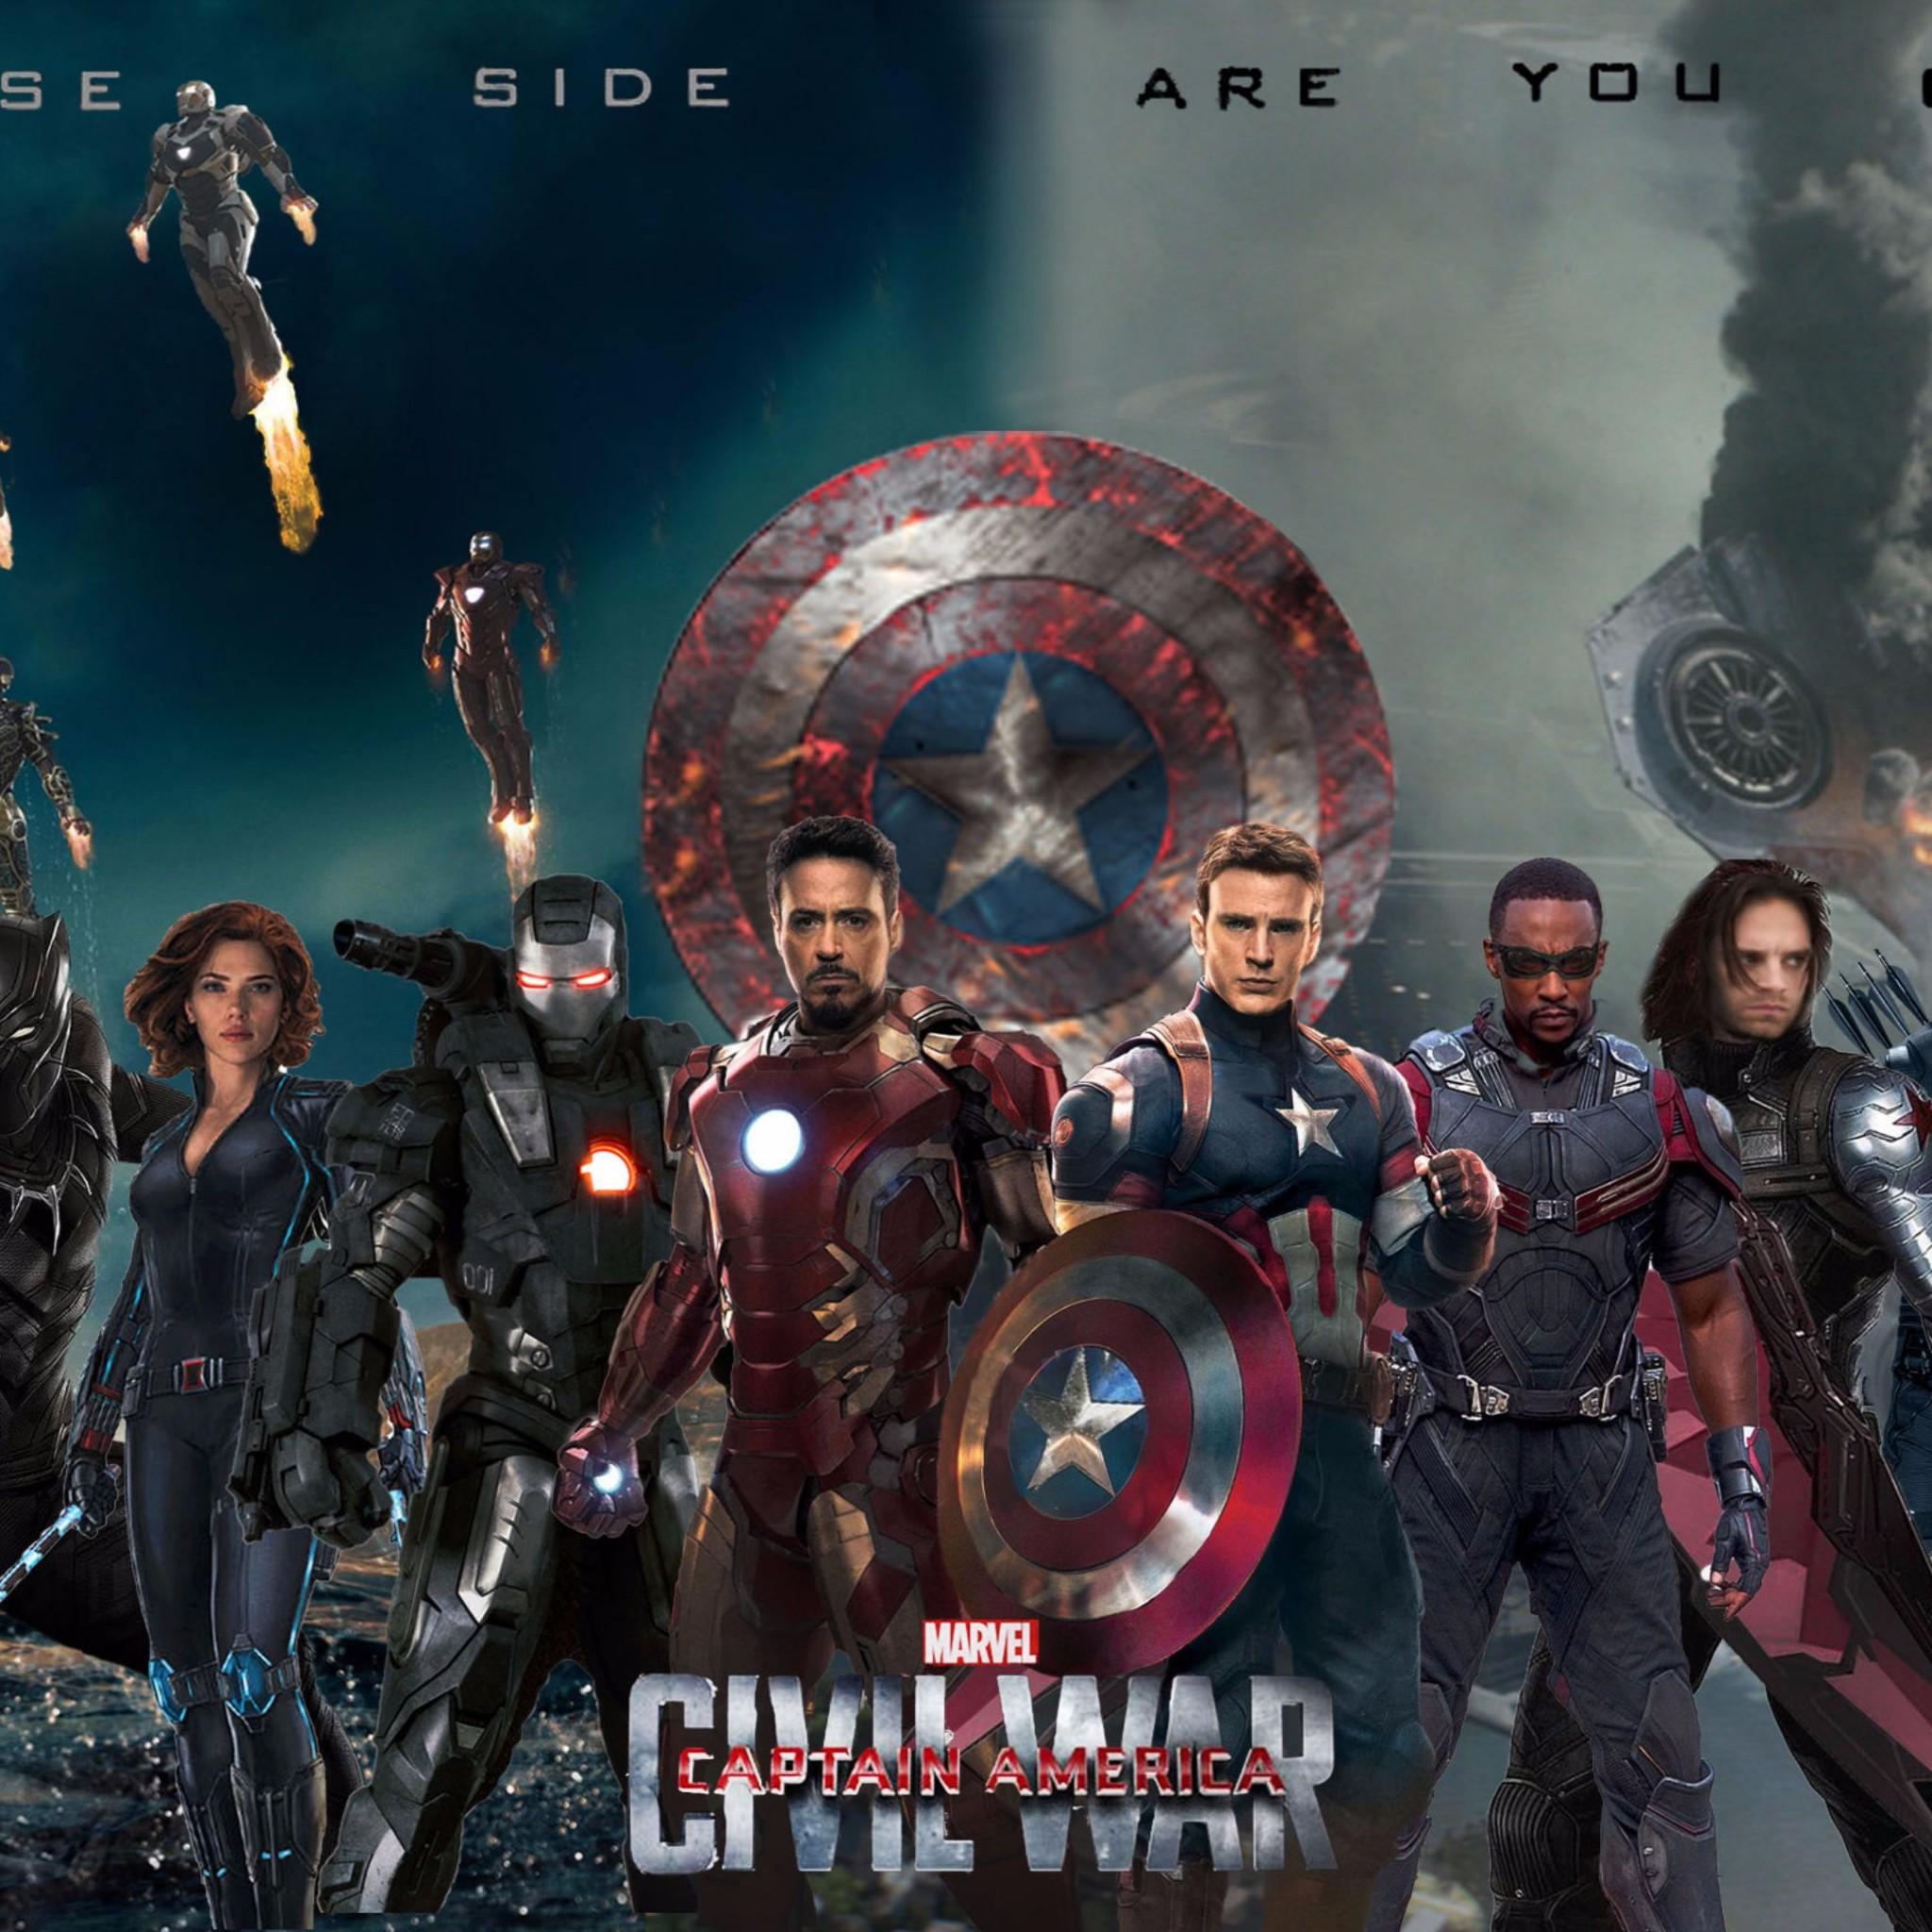 2016 Captain America Civil War 4K Wallpaper 4K Wallpaper 2048x2048